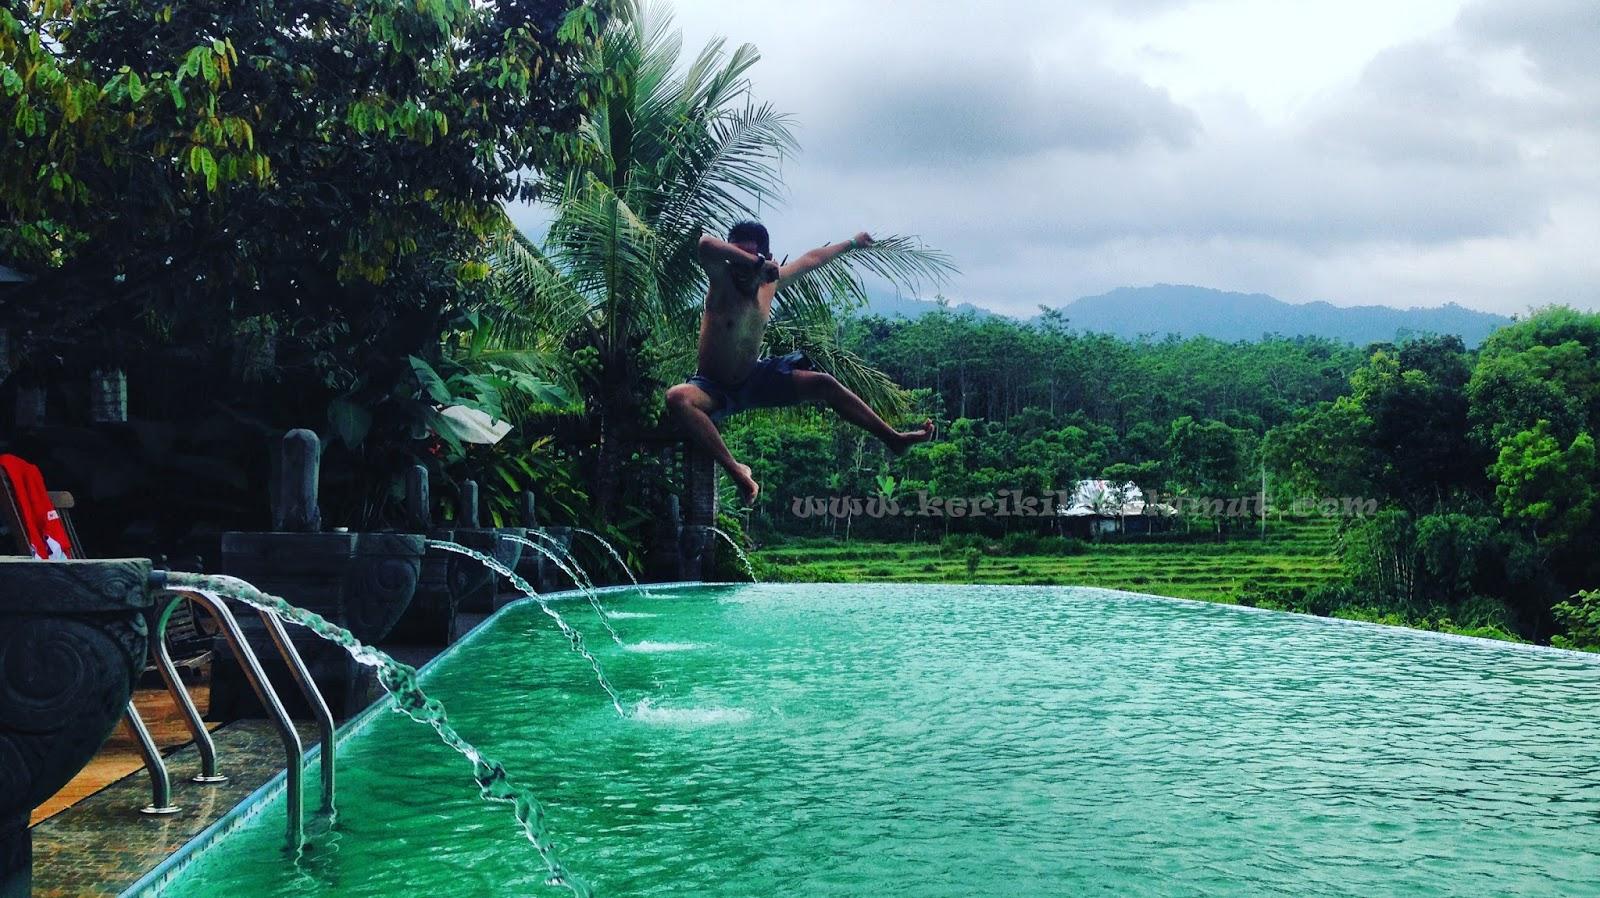 Kampoeng Djawi Sebuah Tempat Wisata Bernuansa Kampung Jawa Tempo Kolam